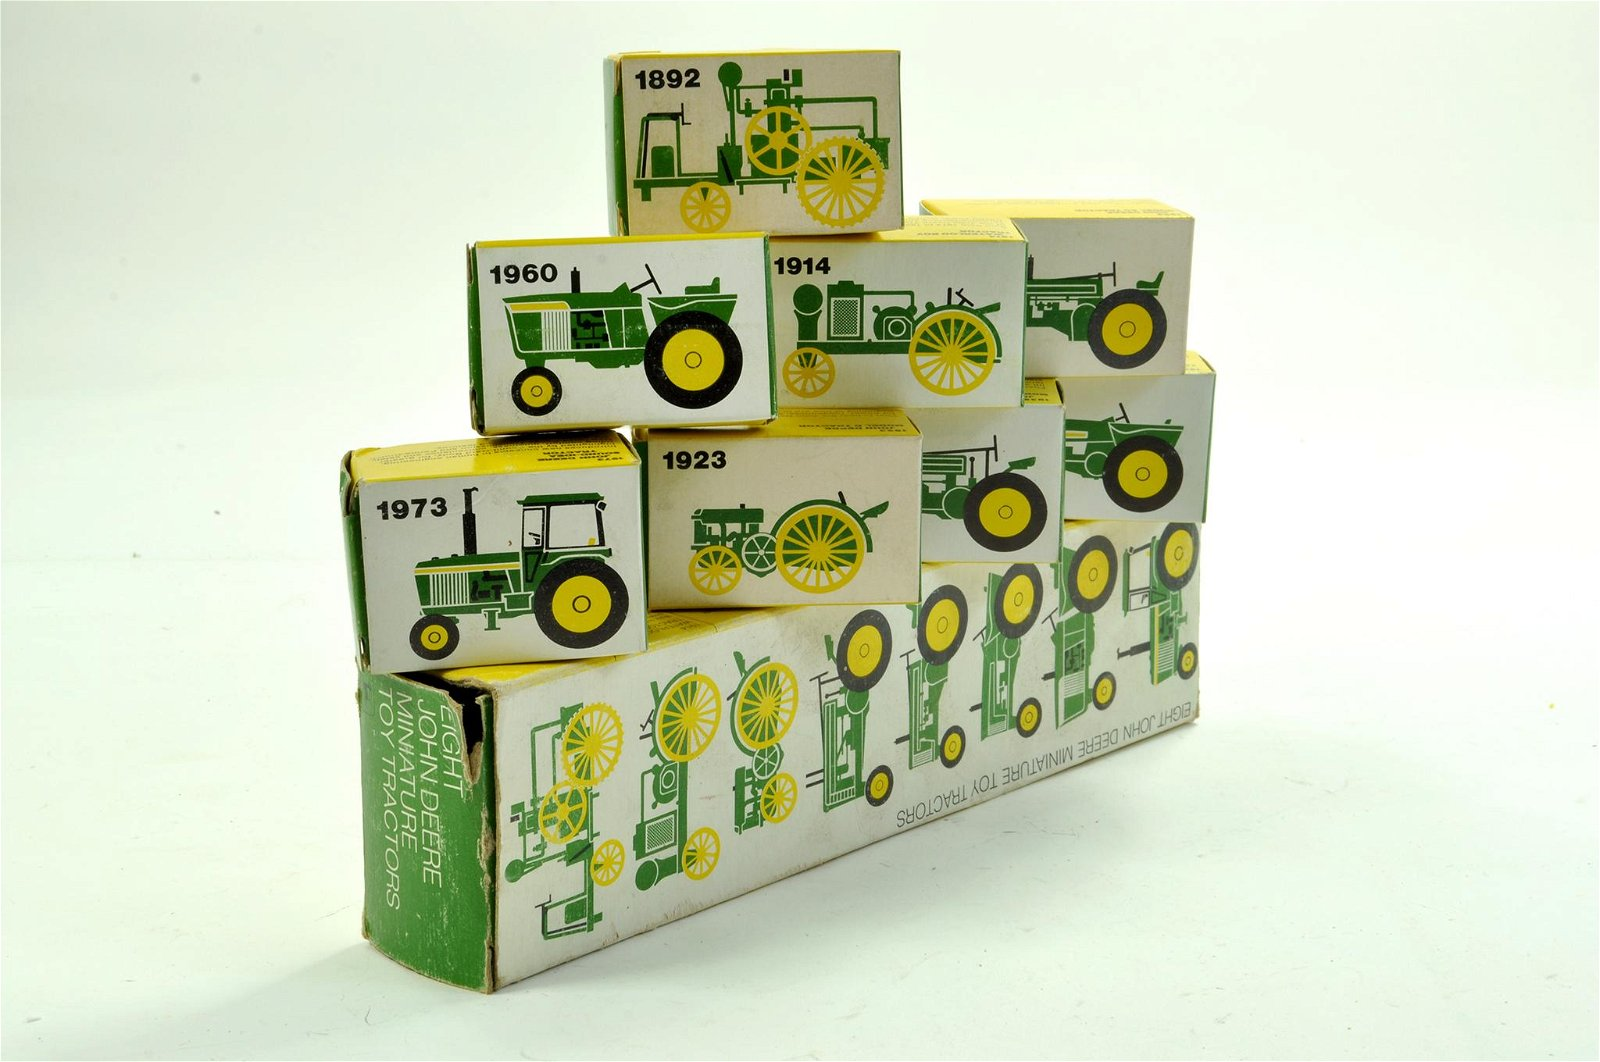 Ertl 1/64 Tractor Timeline Set comprising John Deere